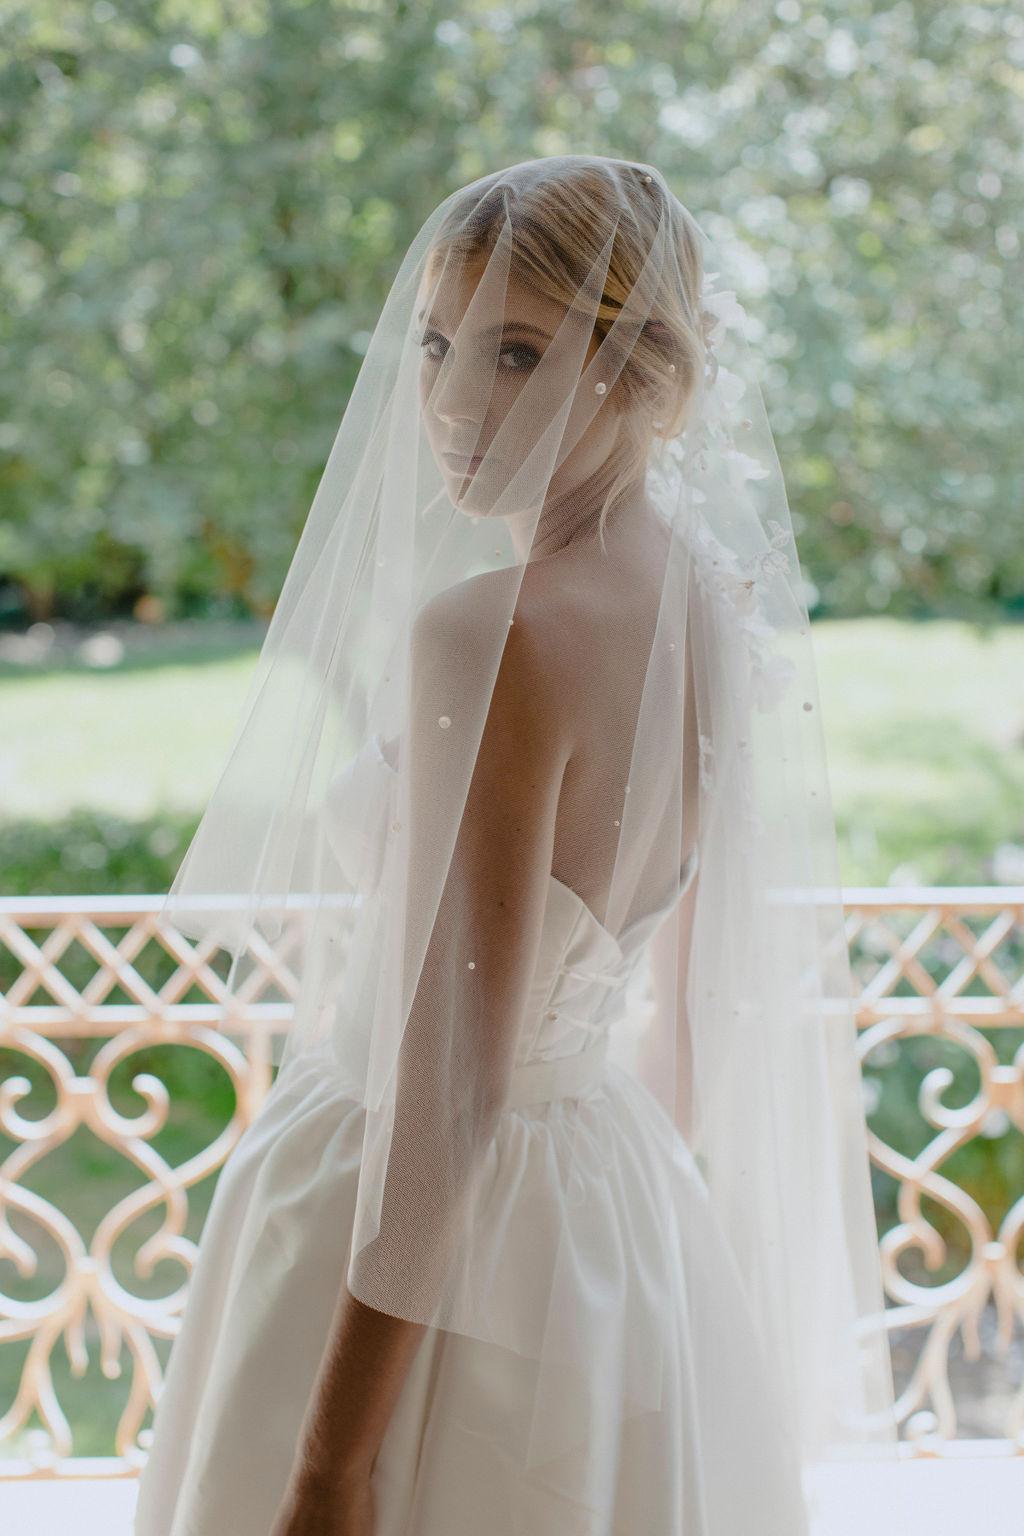 WEEPING CHERRY | EMBELLISHED SHORT WEDDING VEIL by TANIA MARAS